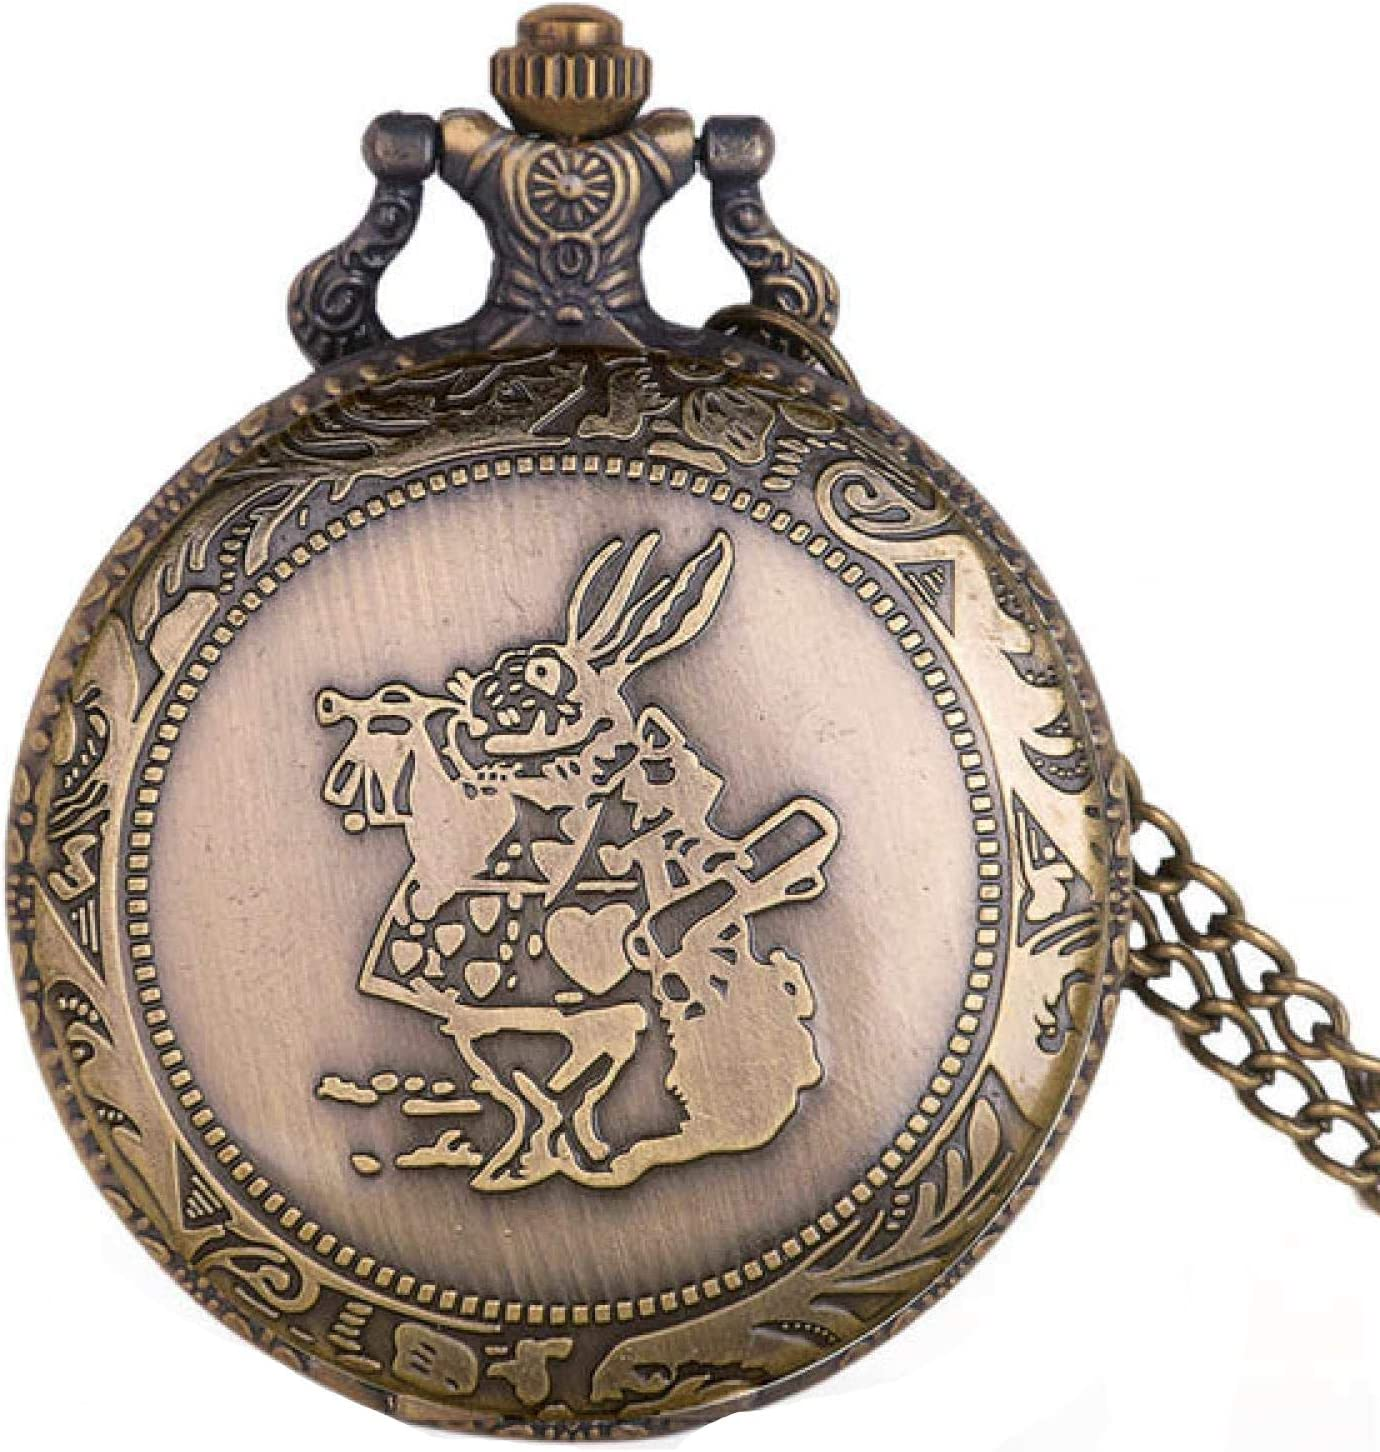 Akopiuto Vintage Pocket Popularity Watches Analog Pendant Necklace Watch Jacksonville Mall